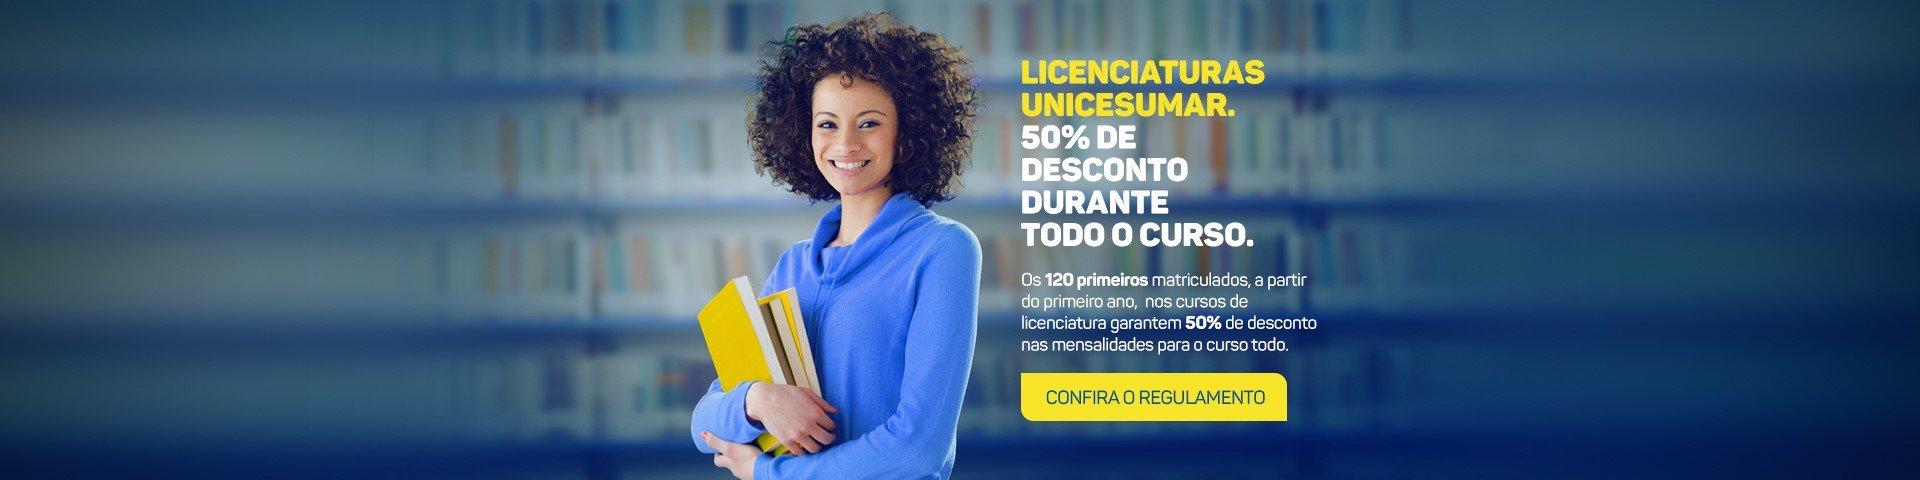 Banner--campanha-Licenciatura-unicesumar-2019